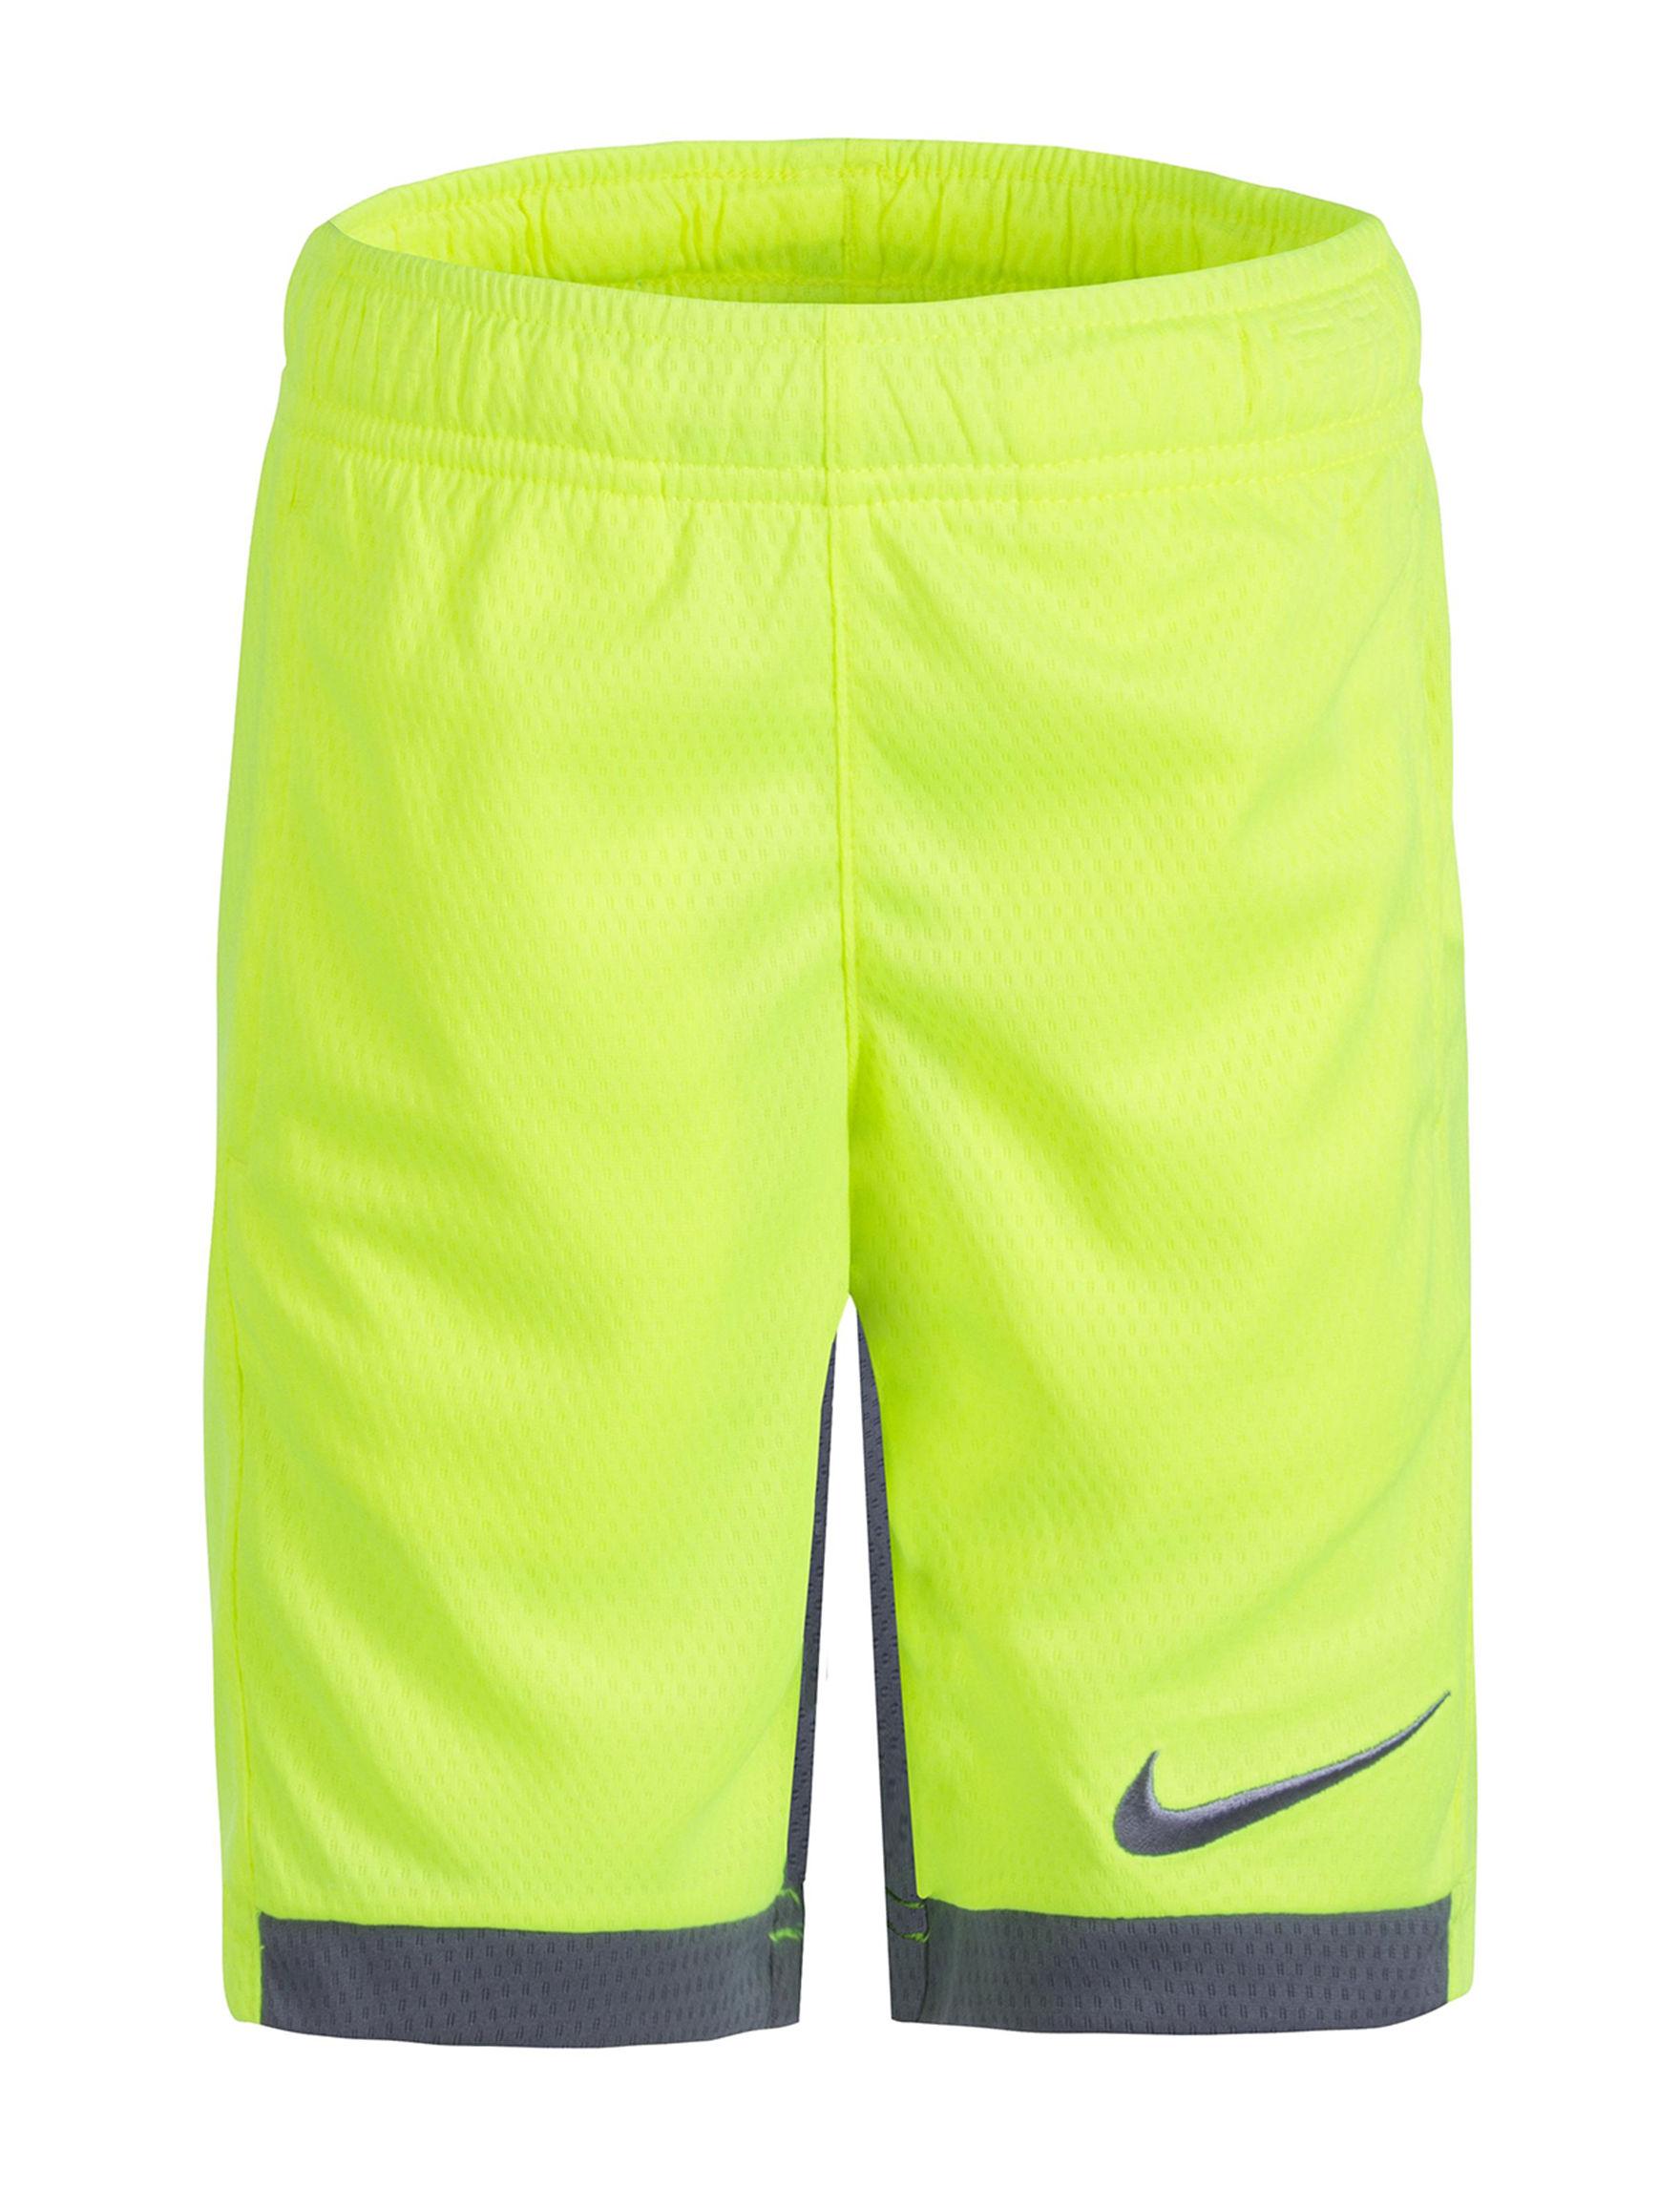 Nike Neon Yellow